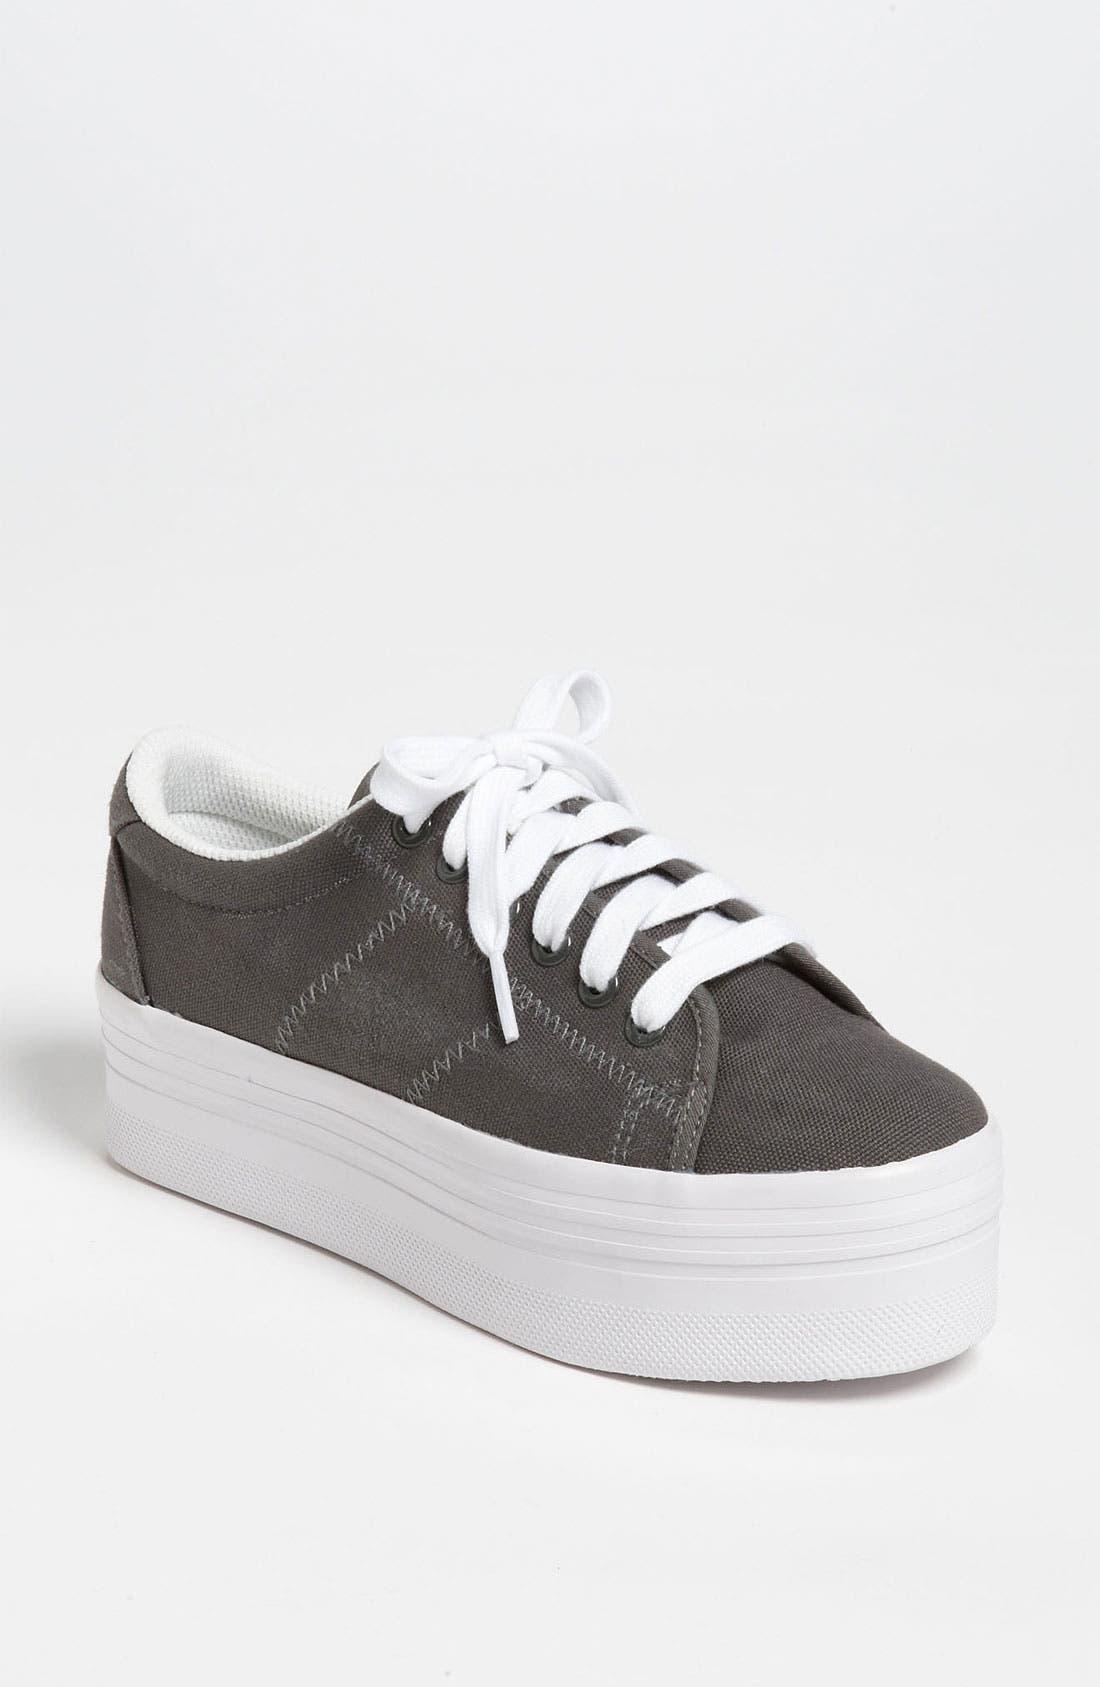 Alternate Image 1 Selected - Jeffrey Campbell 'Zomg' Sneaker